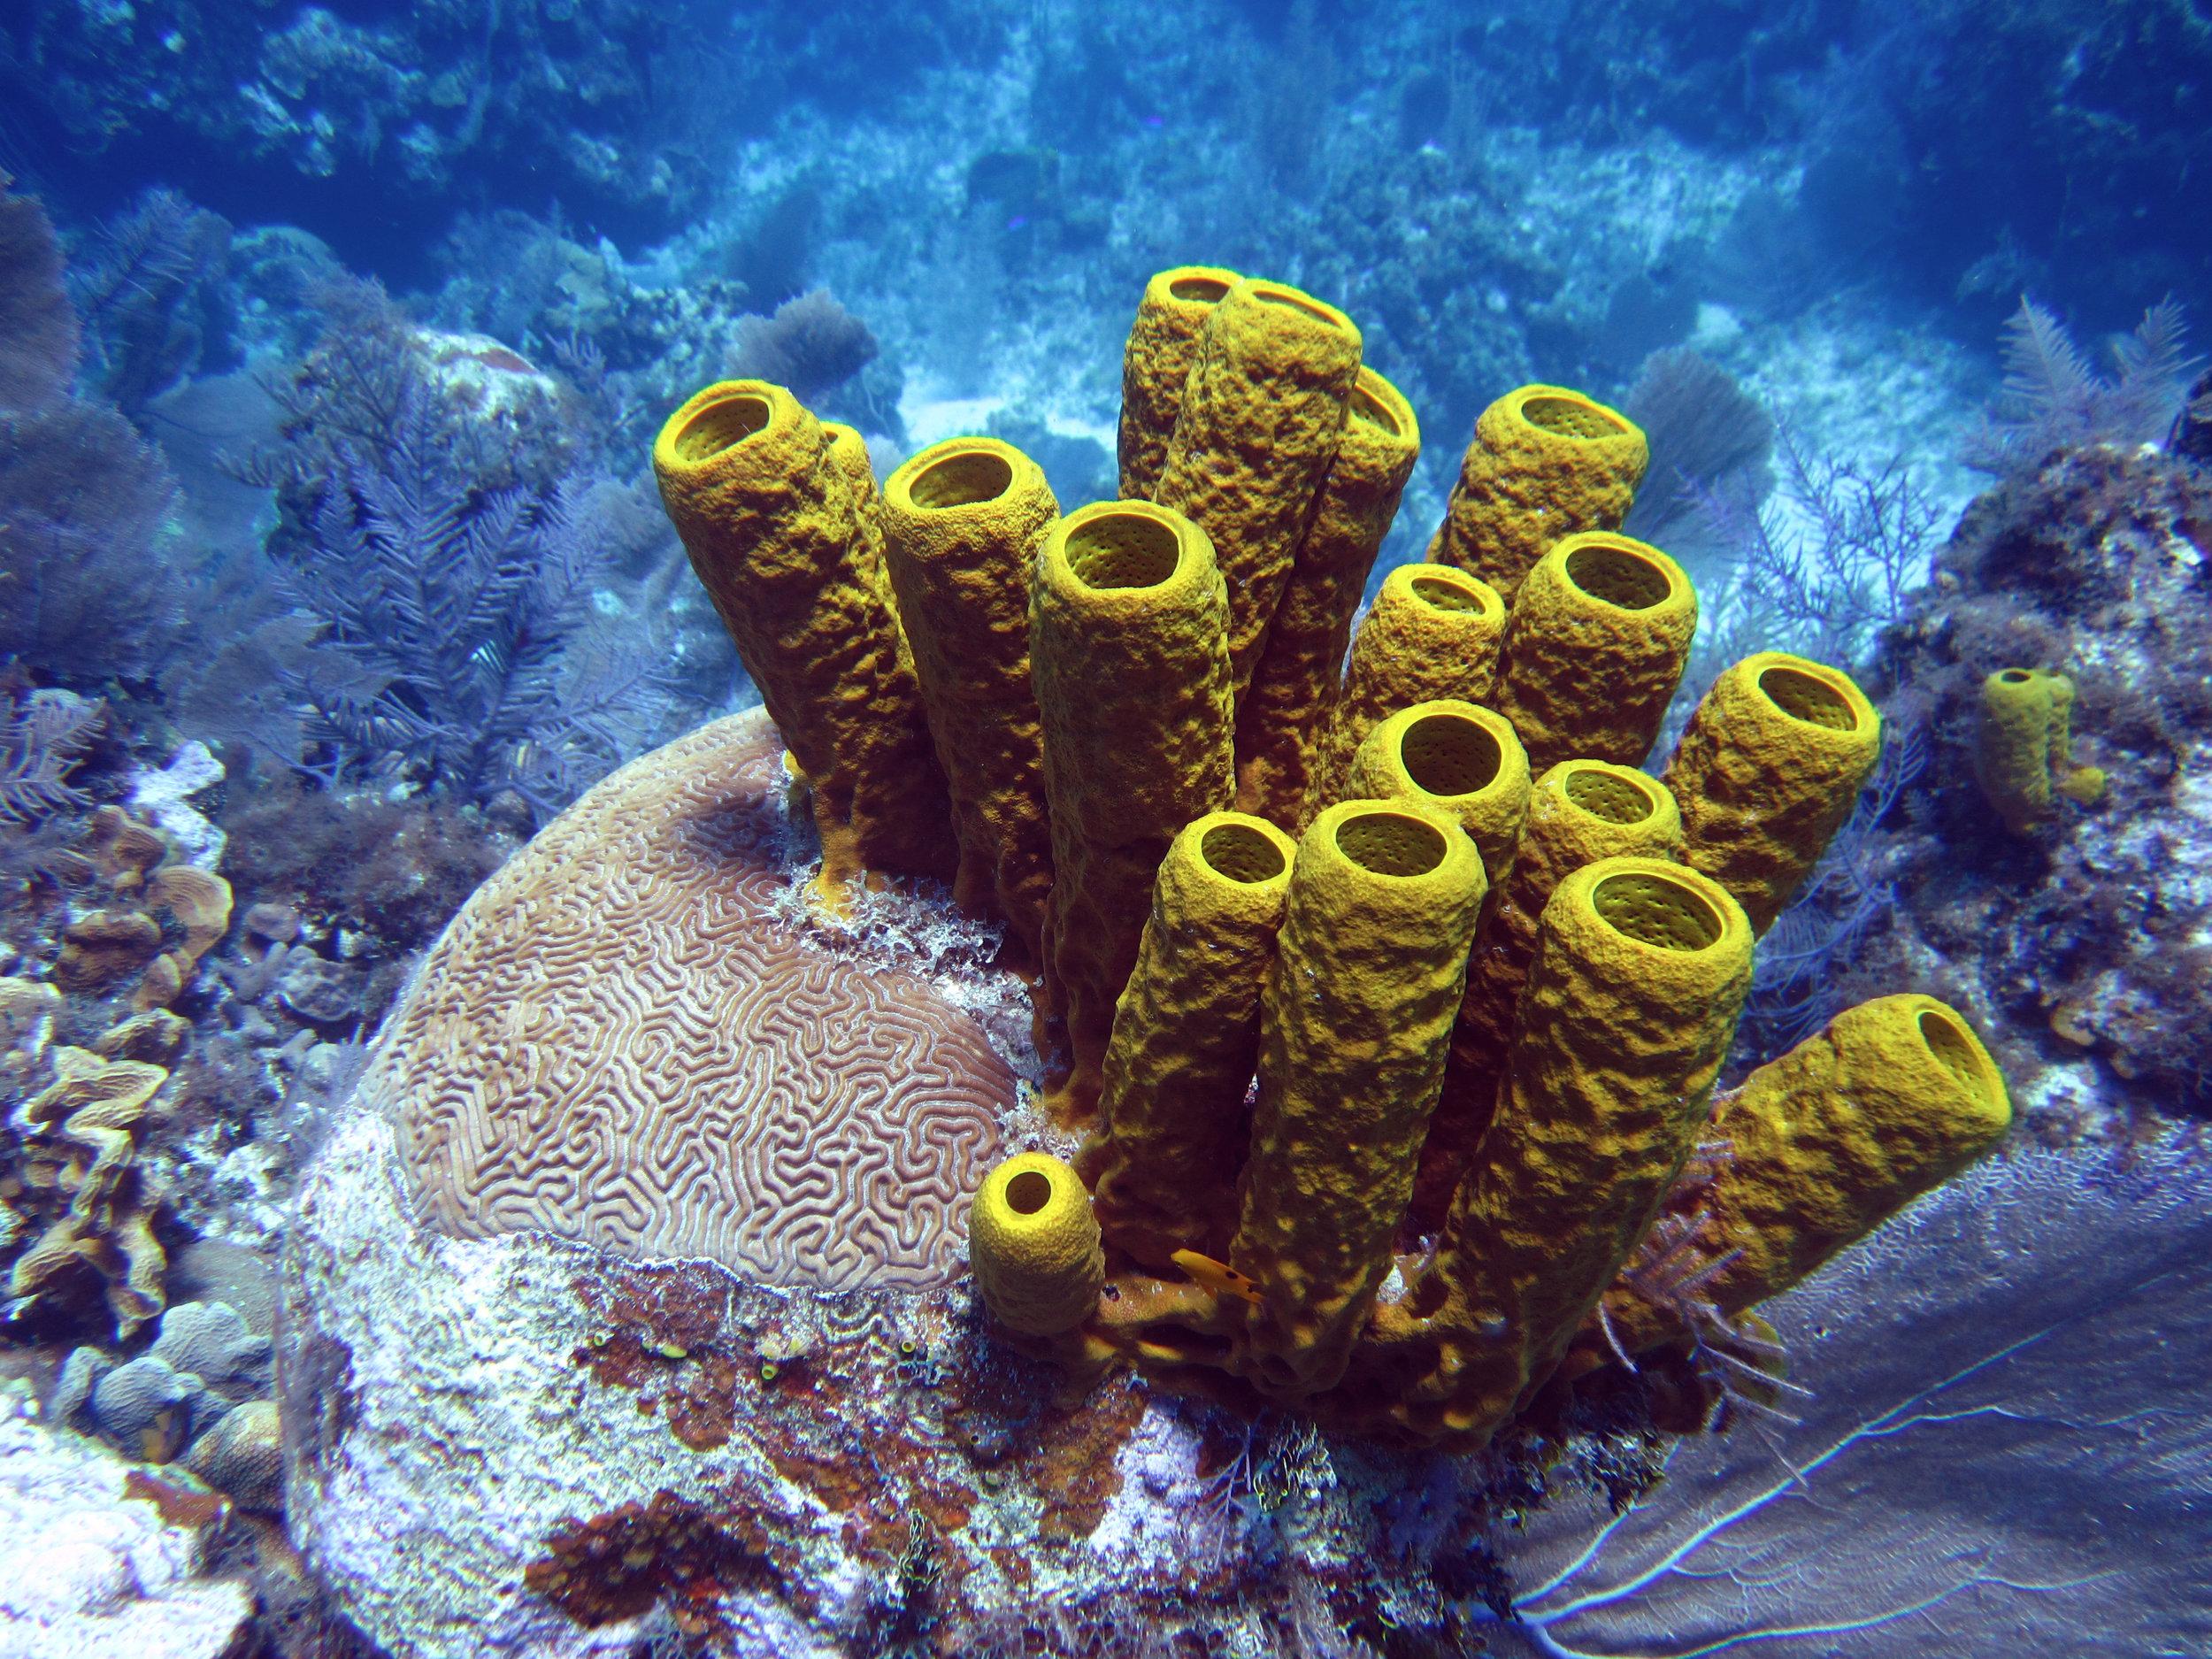 The yellow tube sponge, Aplysina fistularis, common at Caribbean reefs.